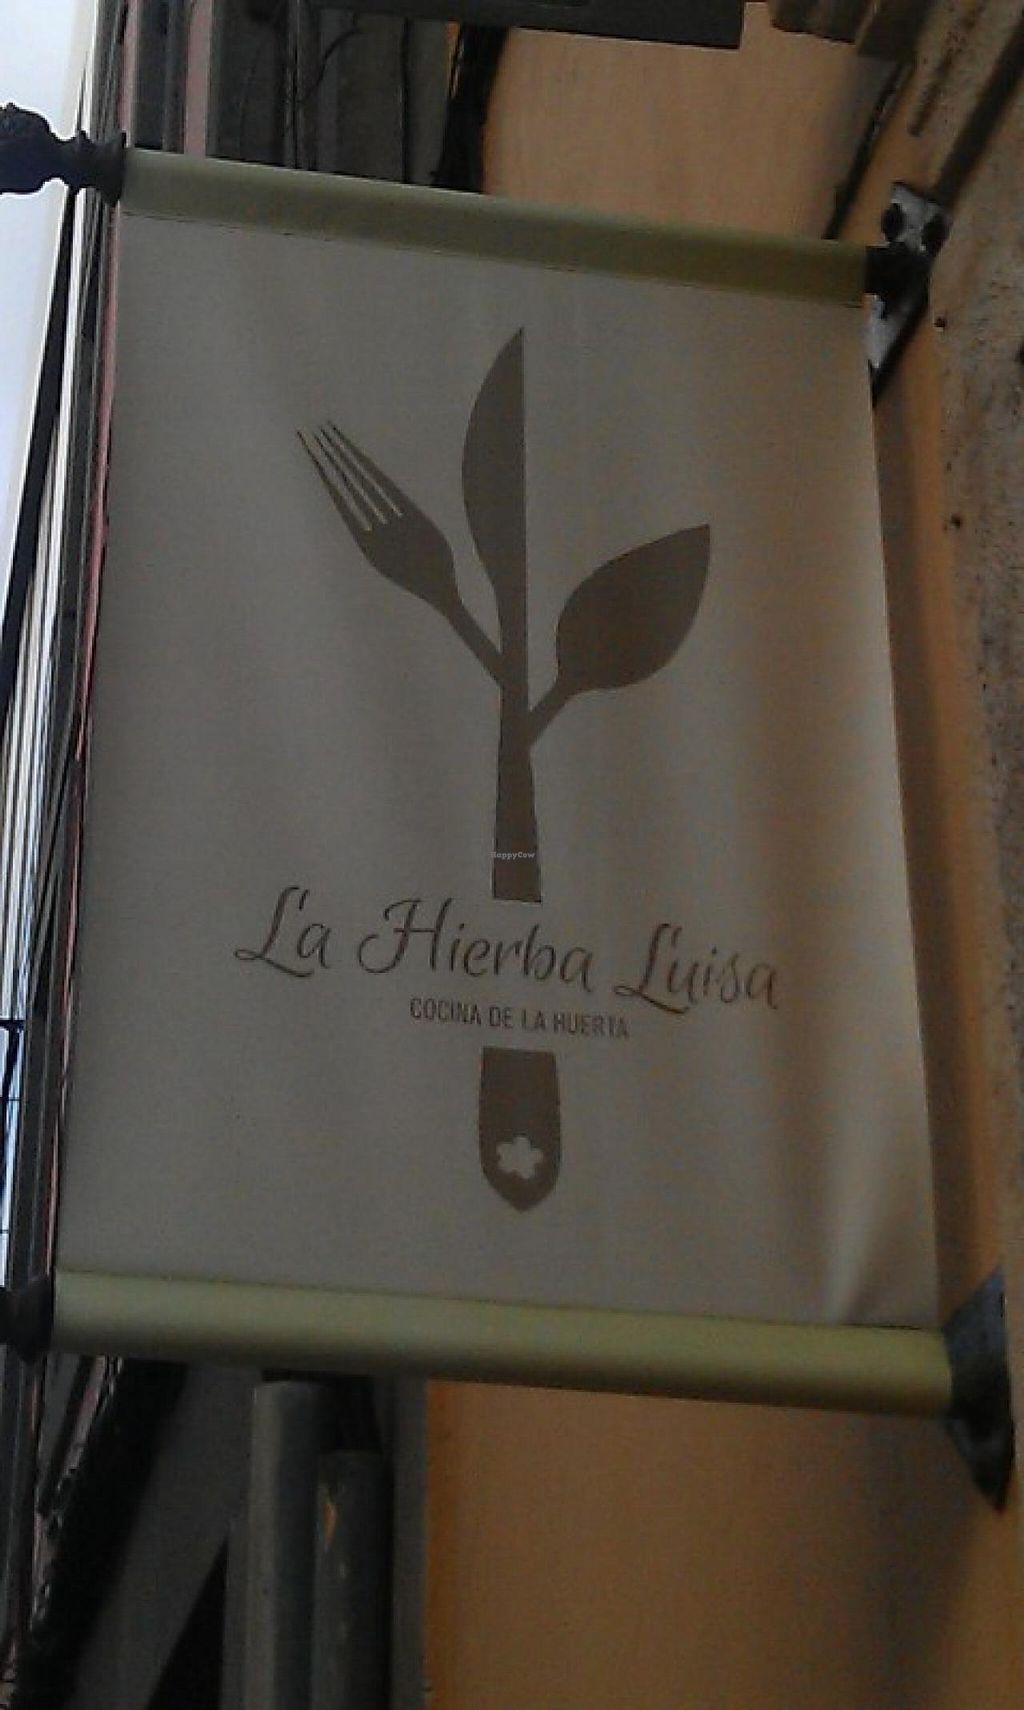 "Photo of La Hierba Luisa Cocina de la Huerta  by <a href=""/members/profile/Kato69"">Kato69</a> <br/>The sign <br/> December 31, 2014  - <a href='/contact/abuse/image/53689/89081'>Report</a>"